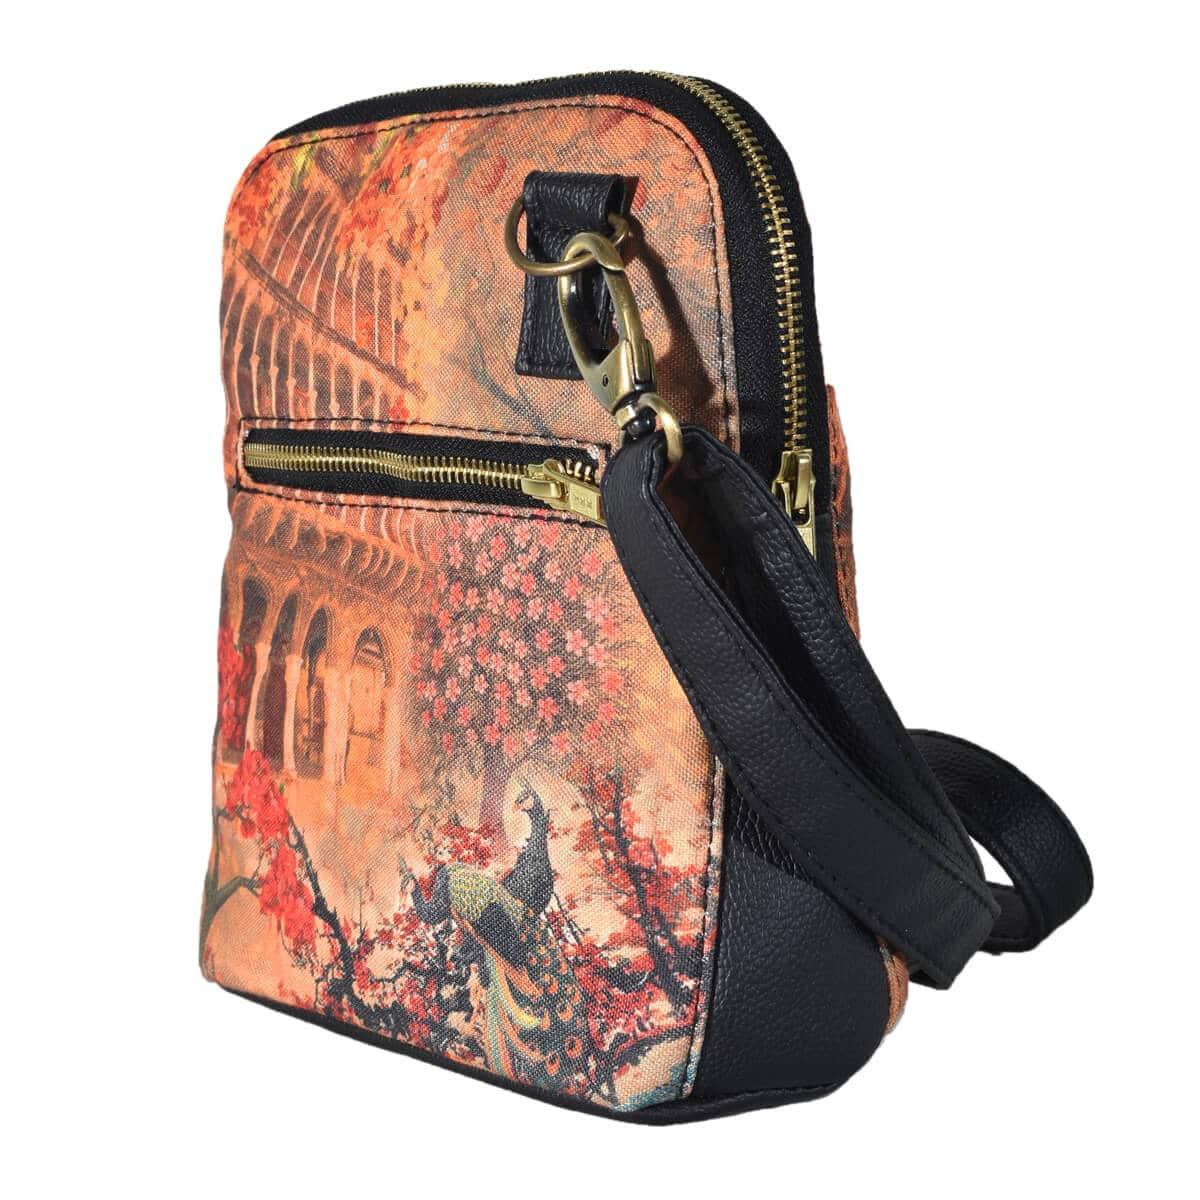 Crossbody Bag Fdcbb004 Other 2